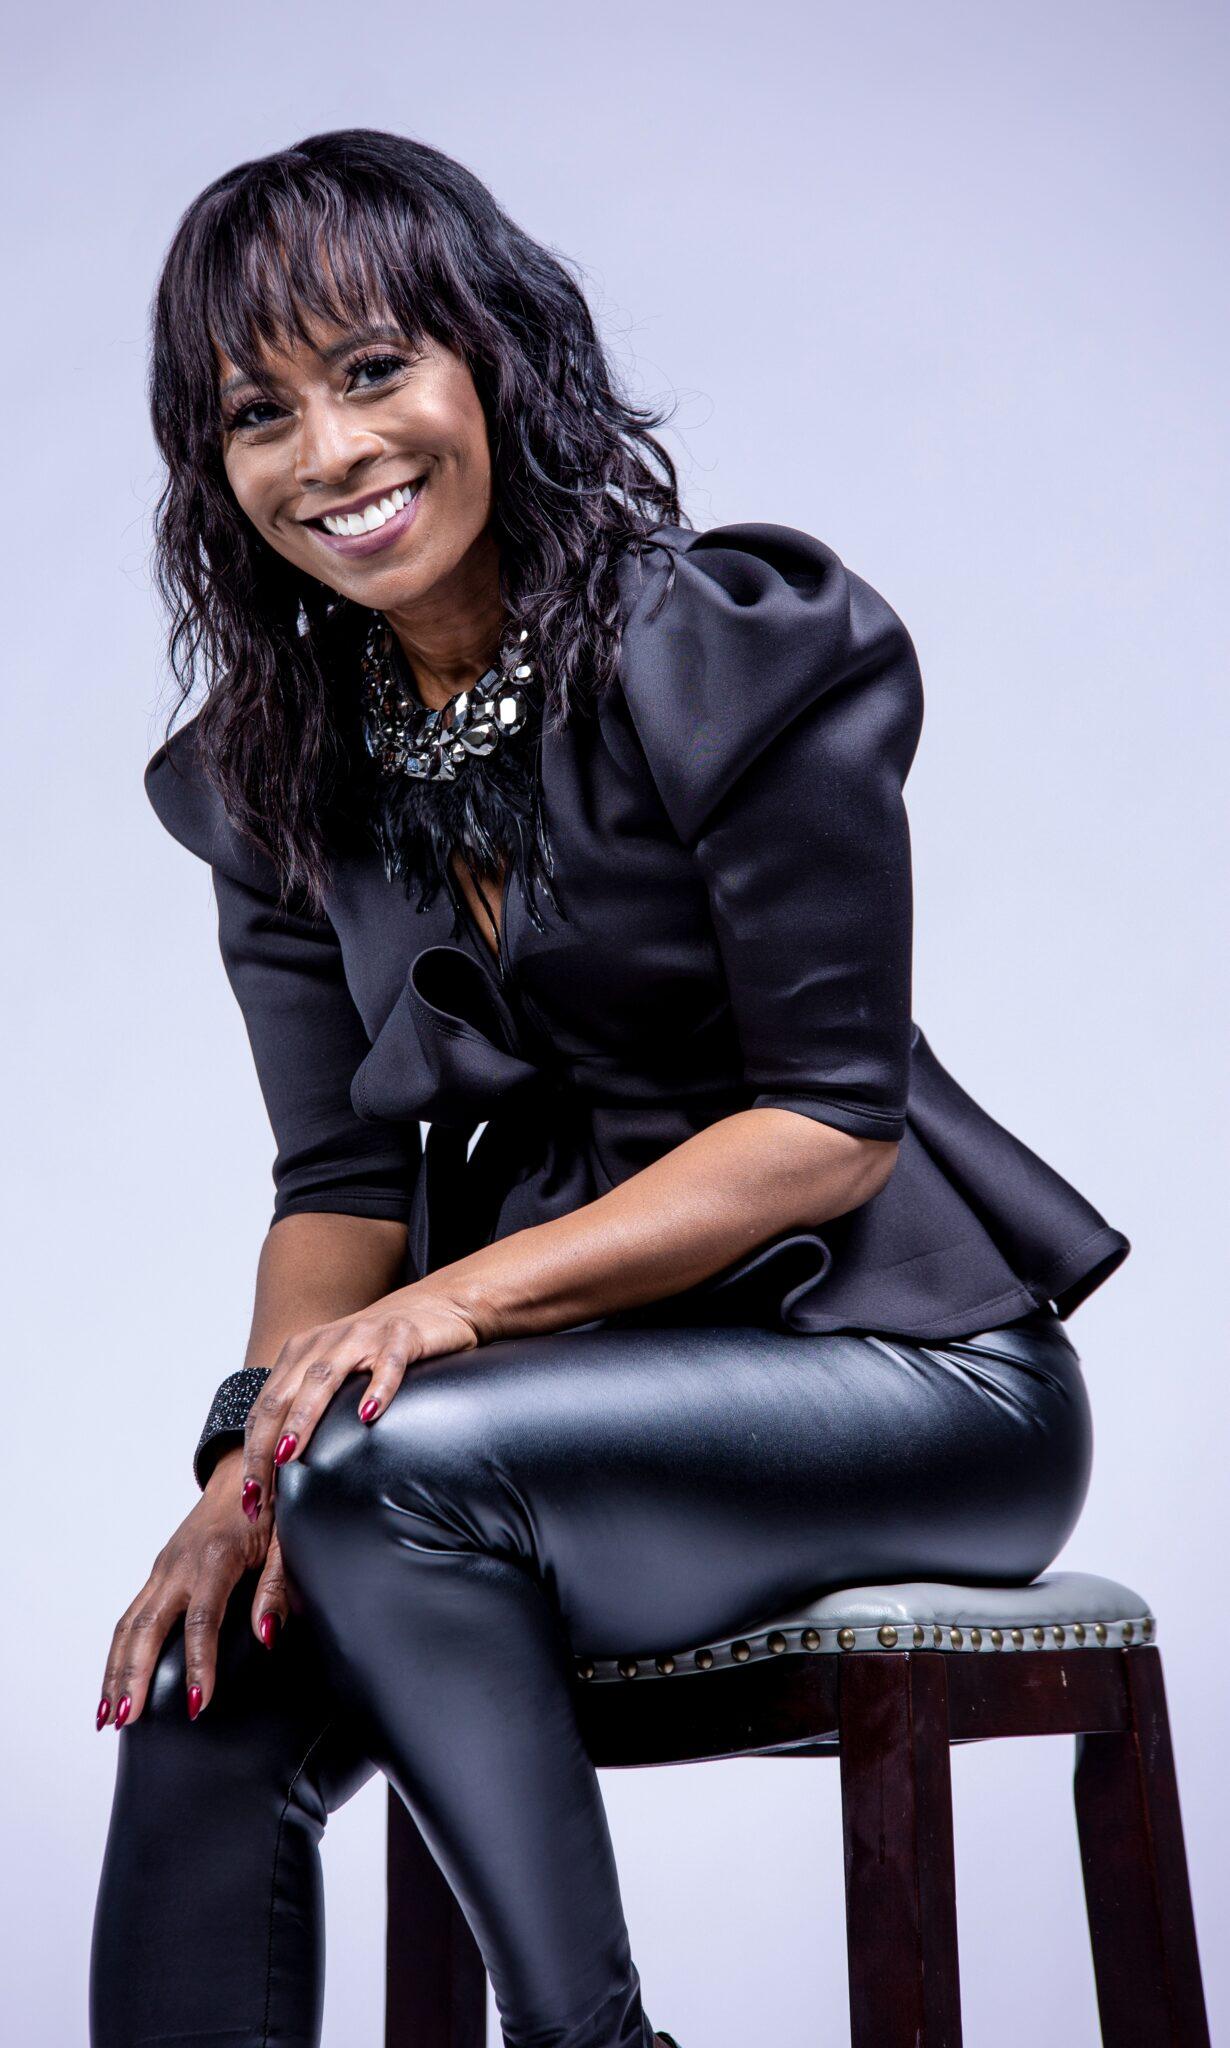 Professional Shot of the Founder, Rachel Jackson